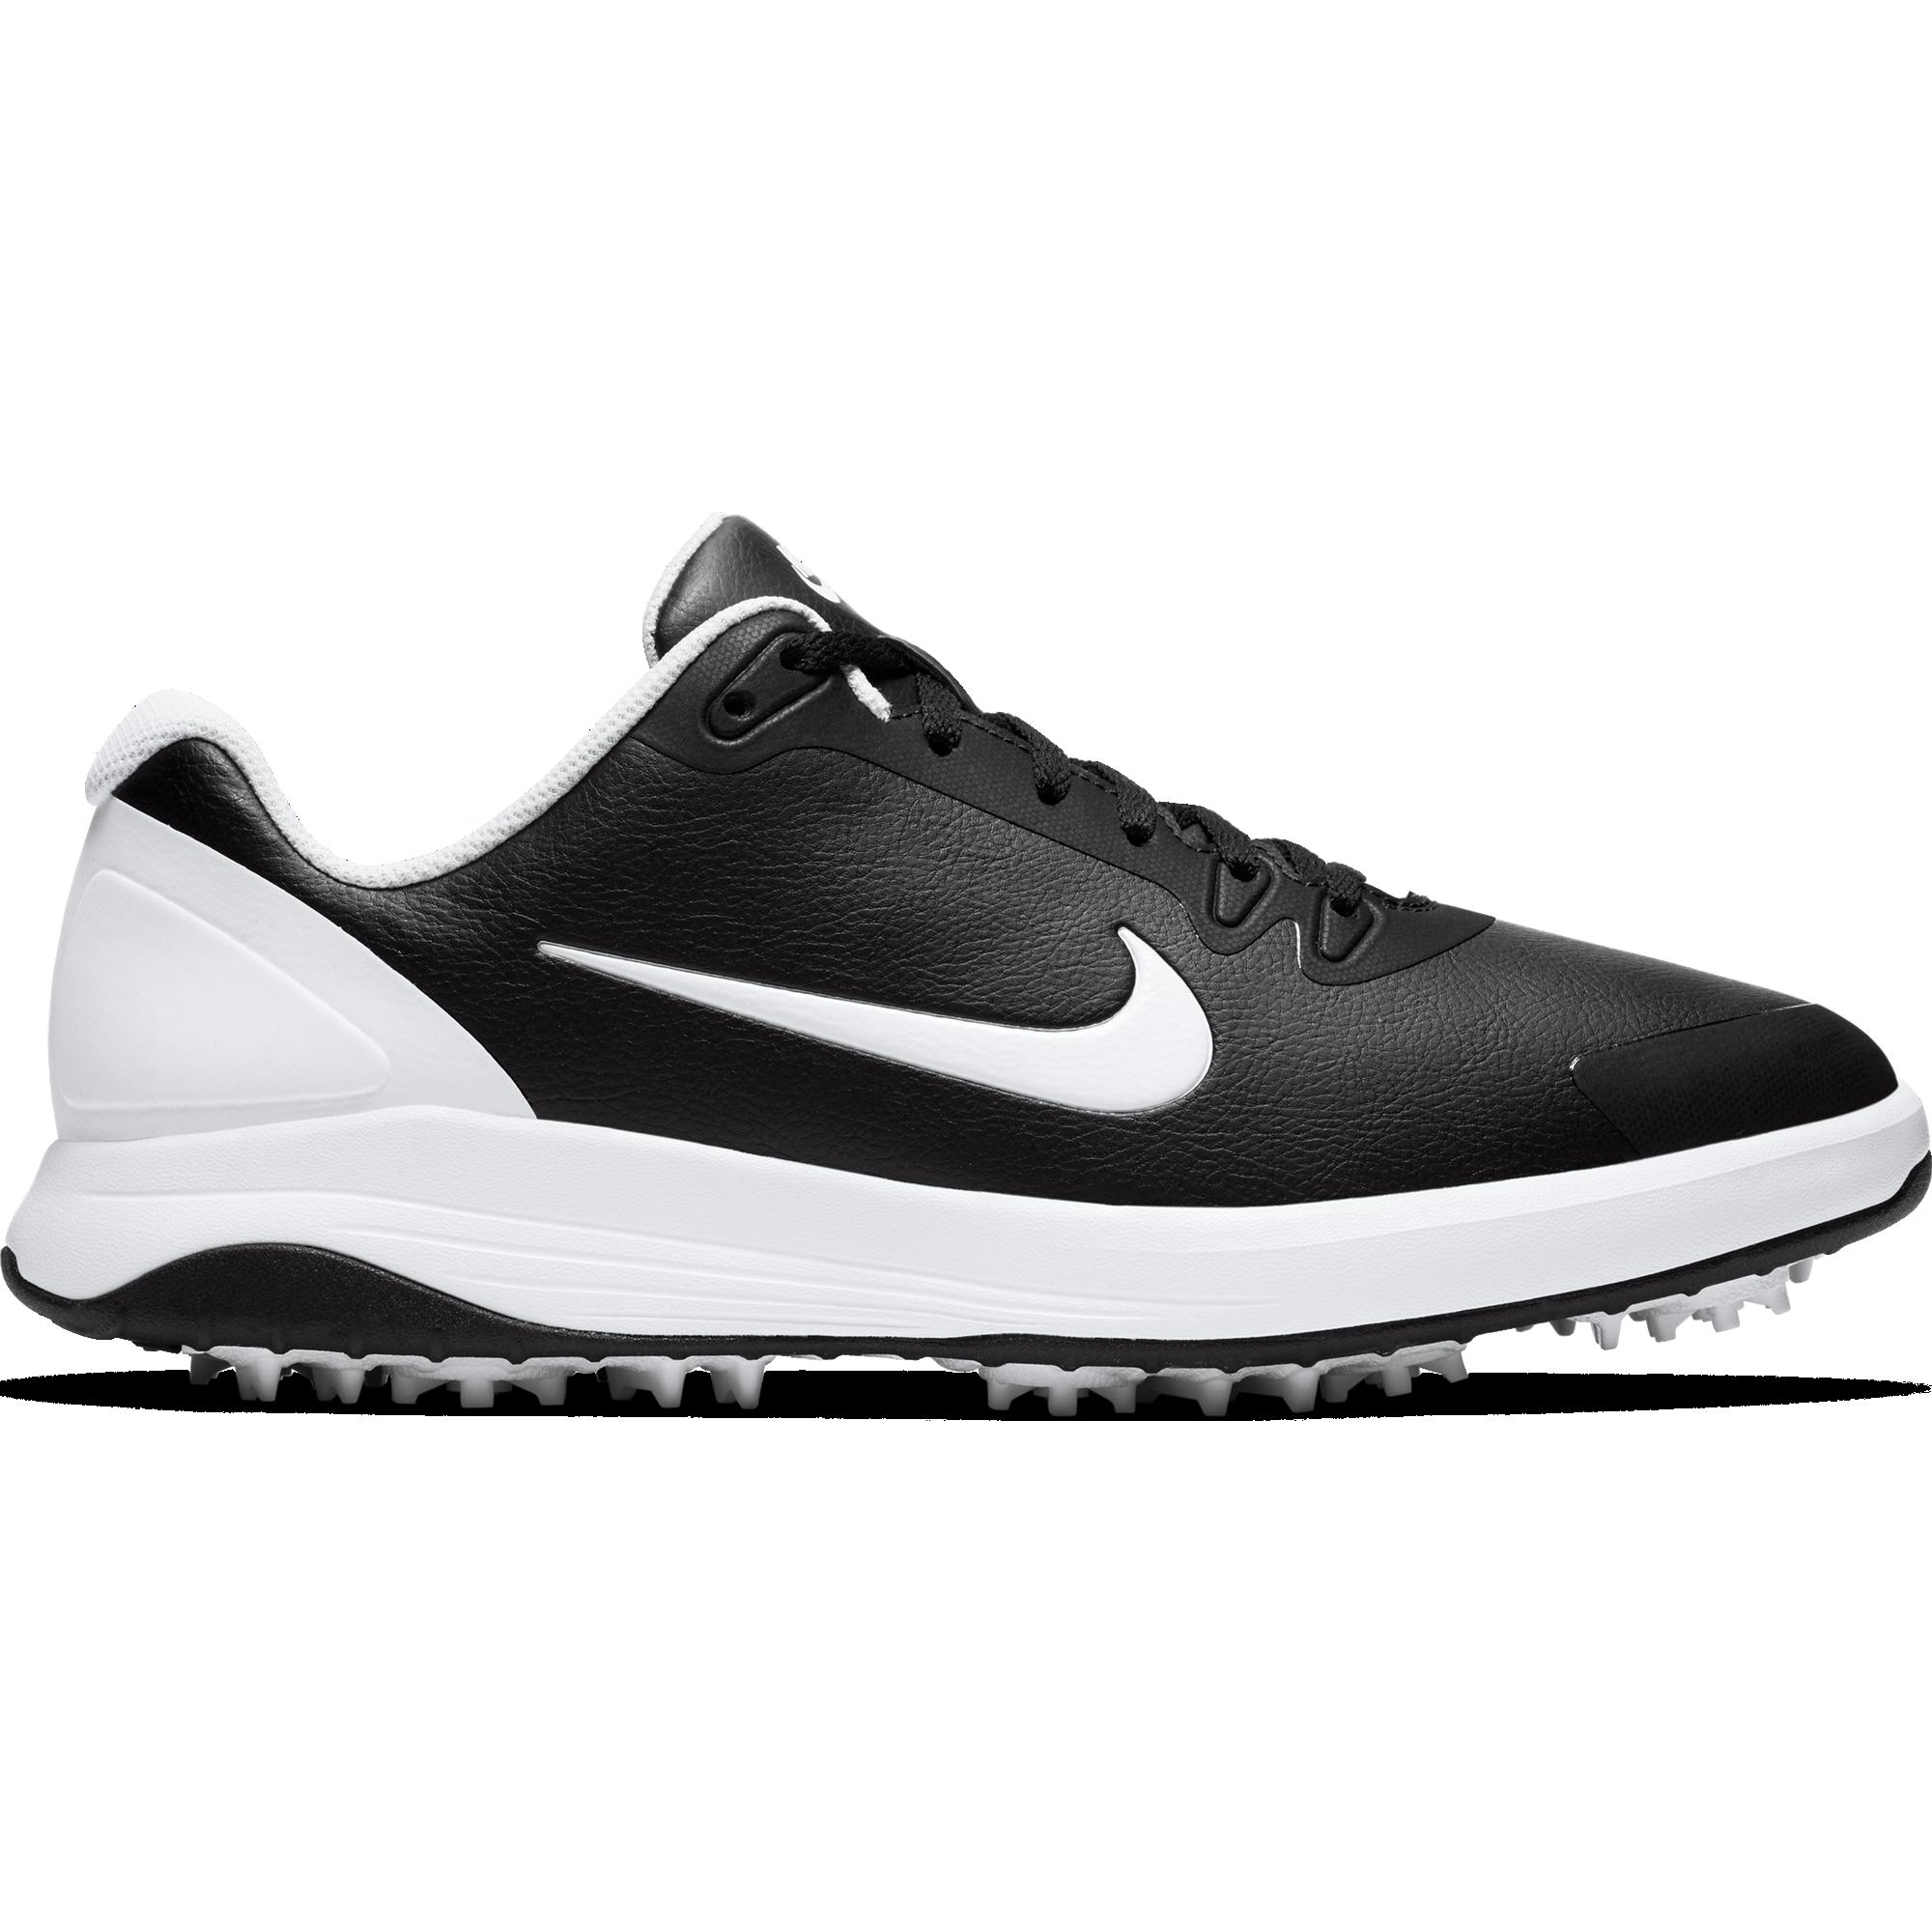 nike golf shoes 2020